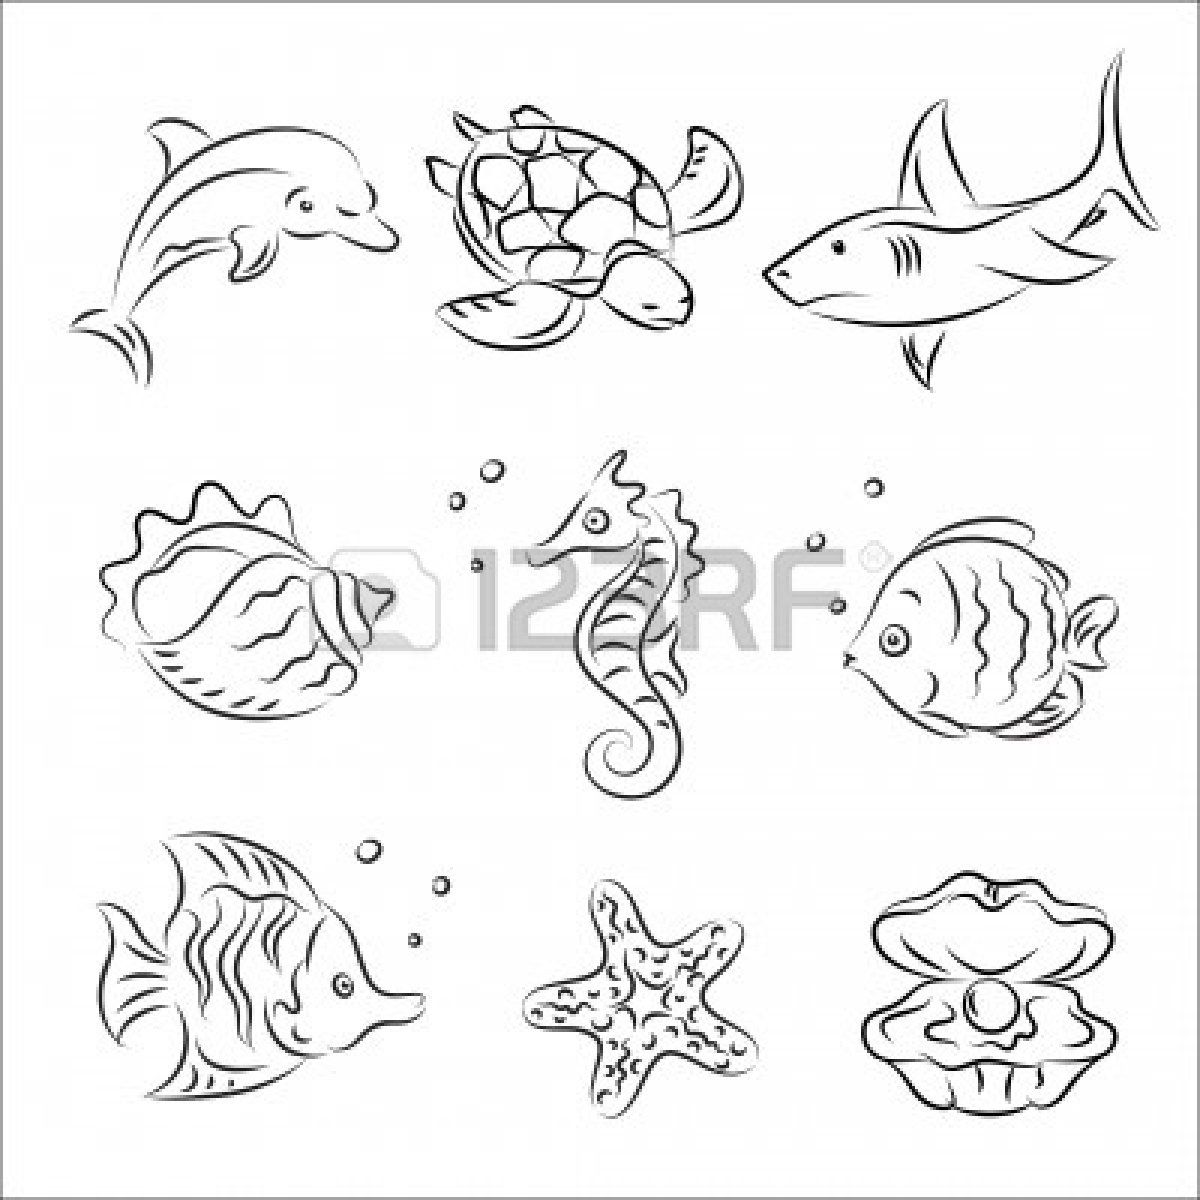 colorful sealife drawings - Google Search   Dibujo   Pinterest ...